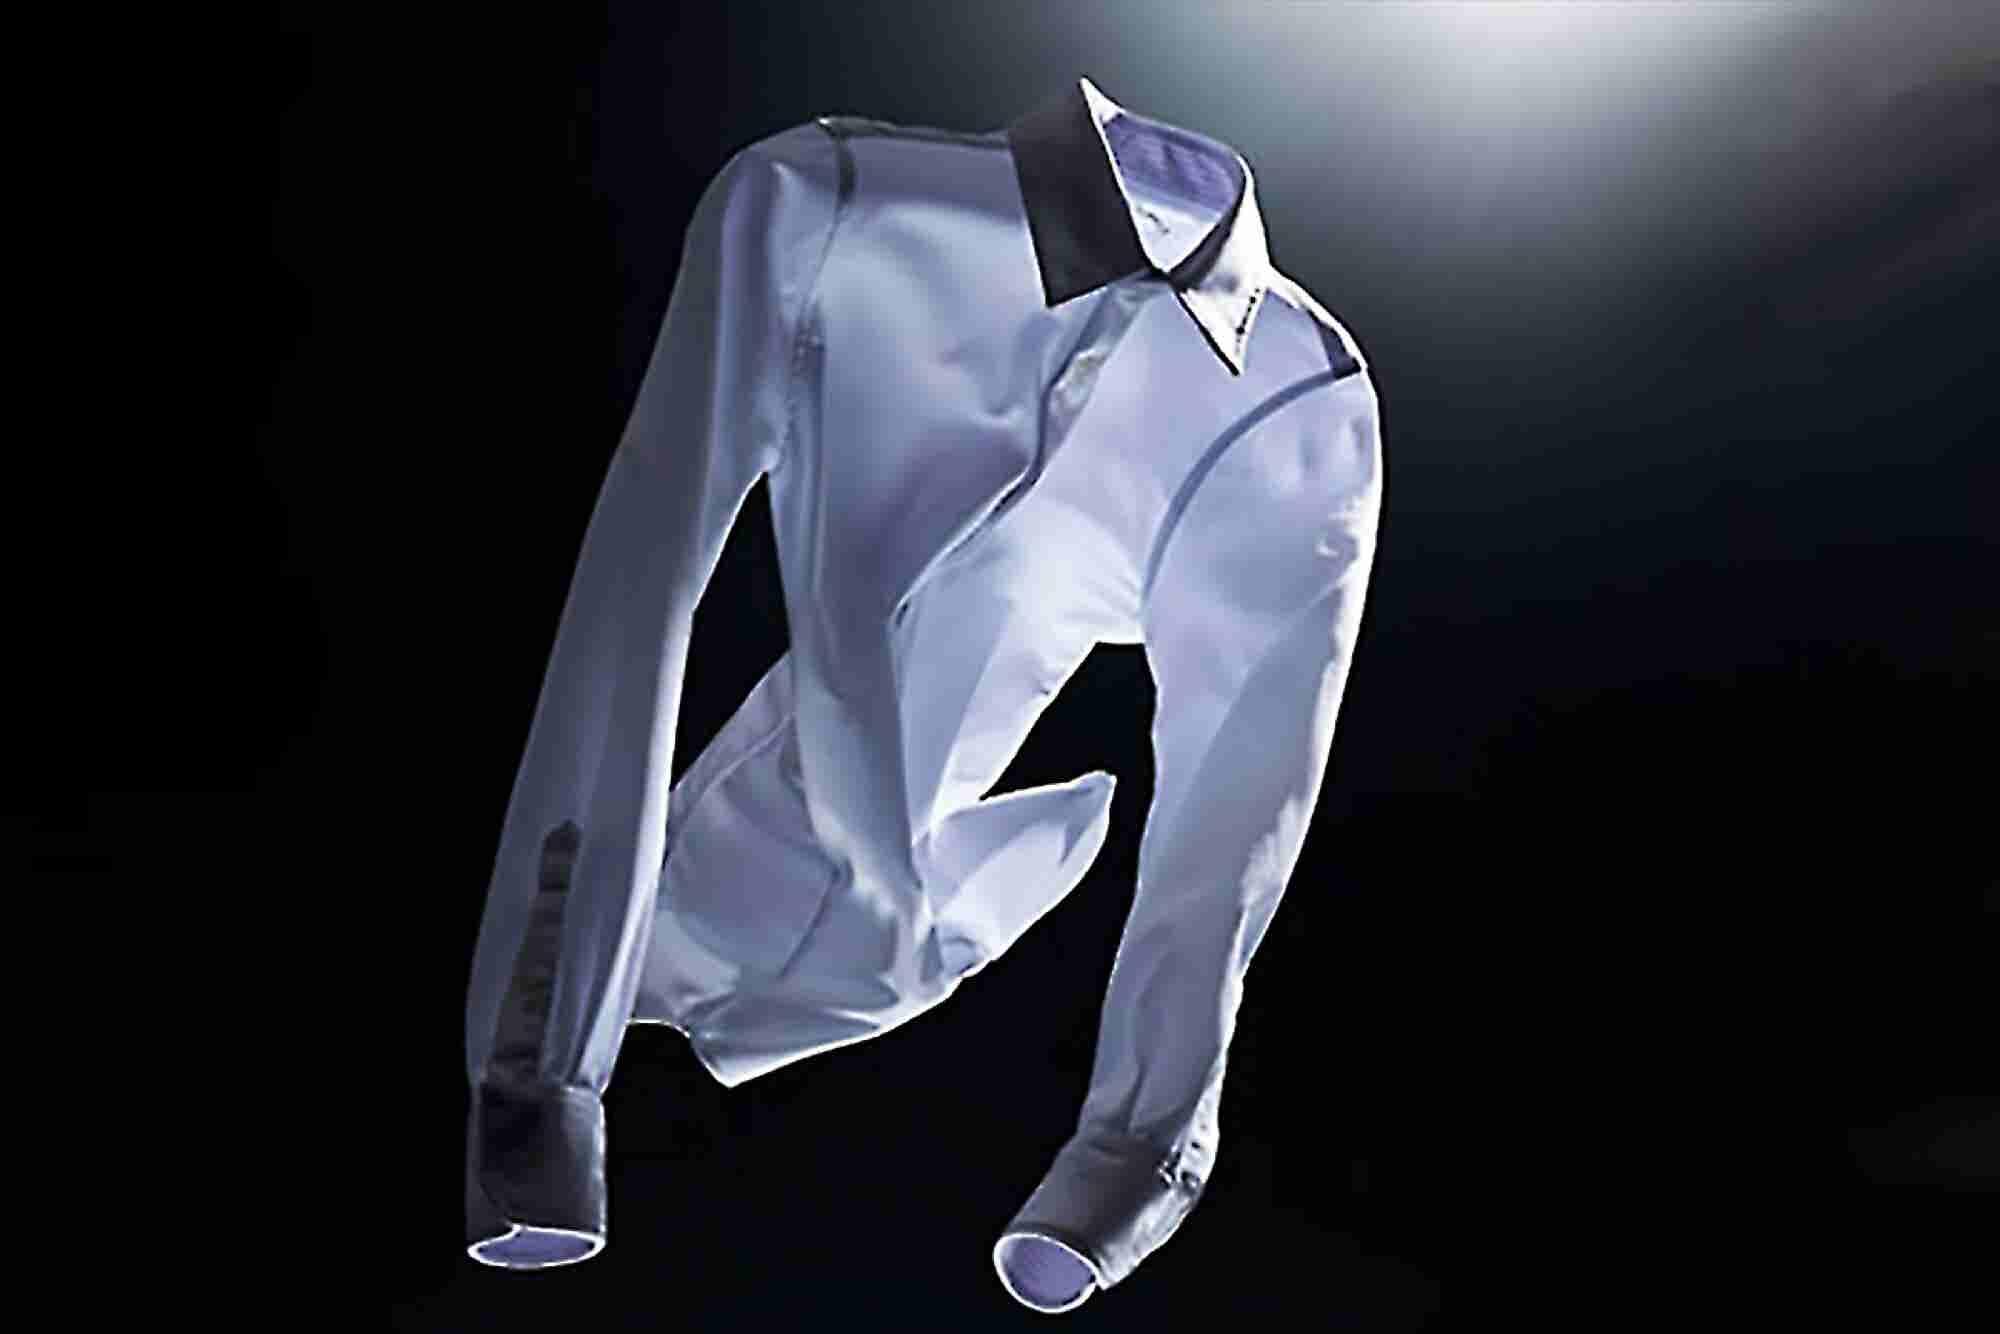 NASA-Inspired Technology Boosts Menswear Line